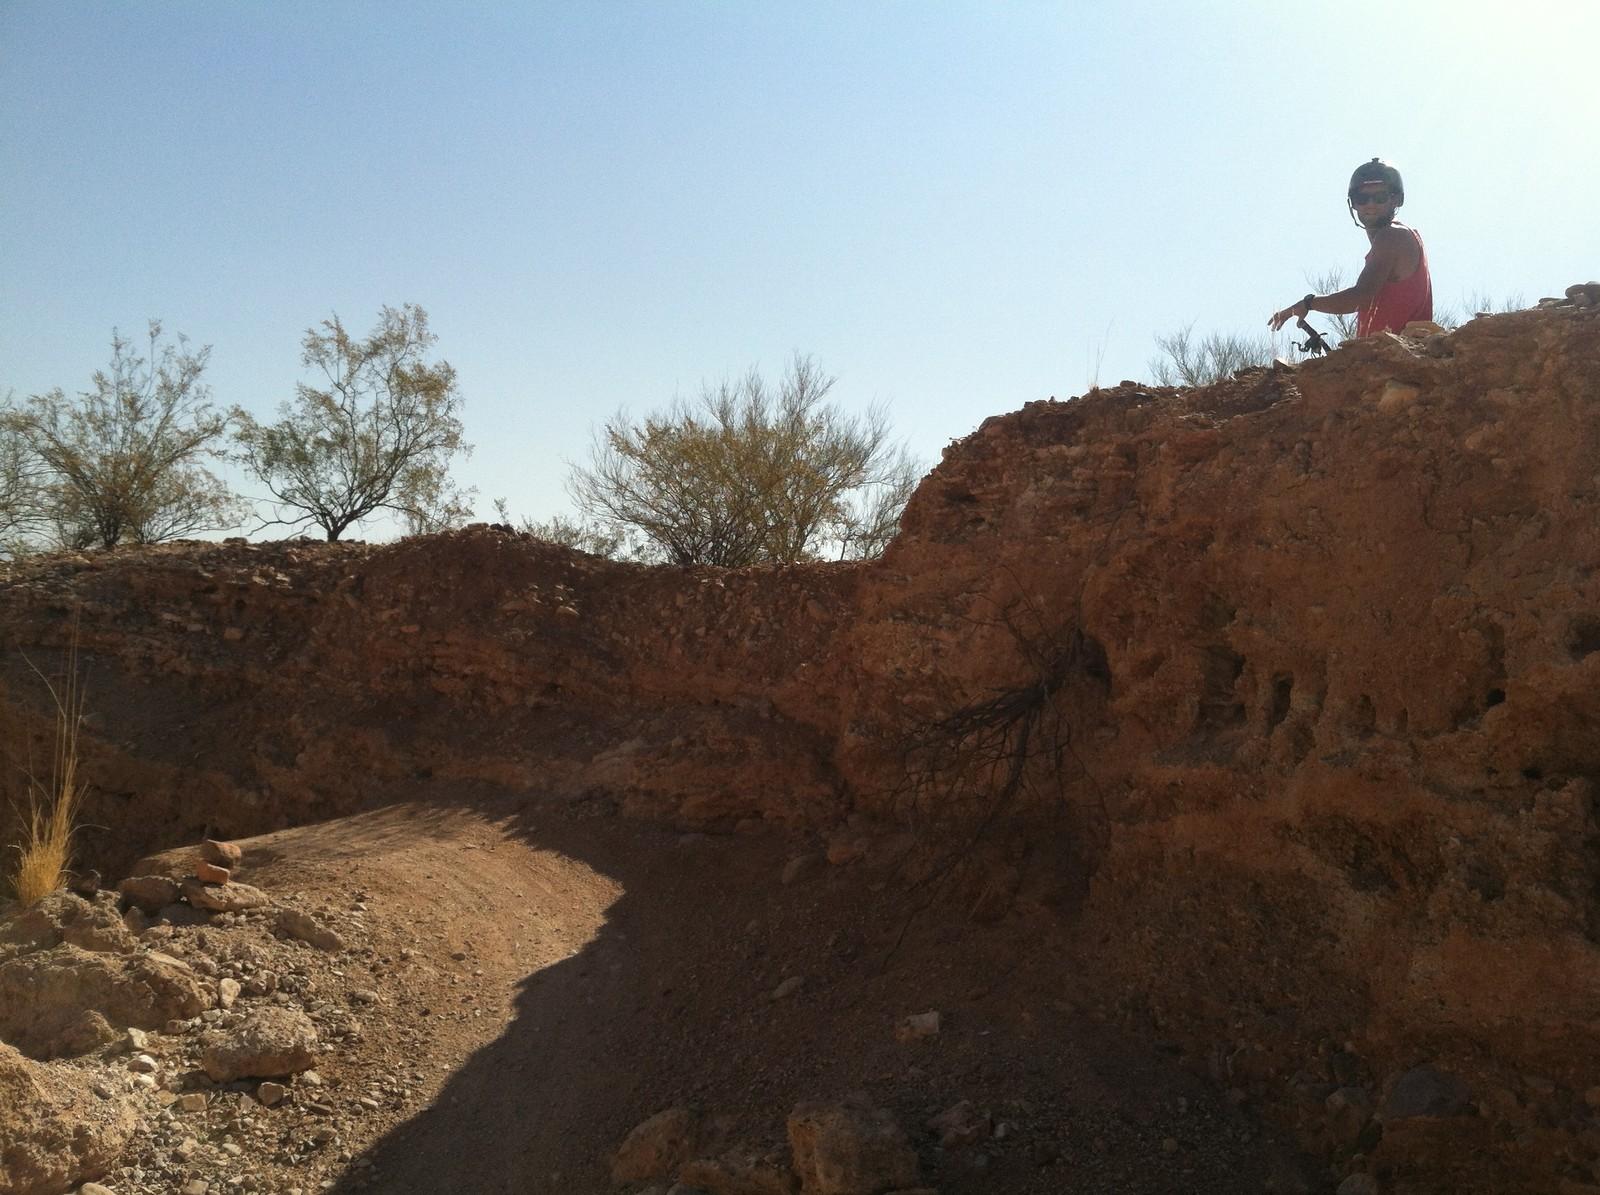 Scoping the line - JordanJoker10 - Mountain Biking Pictures - Vital MTB